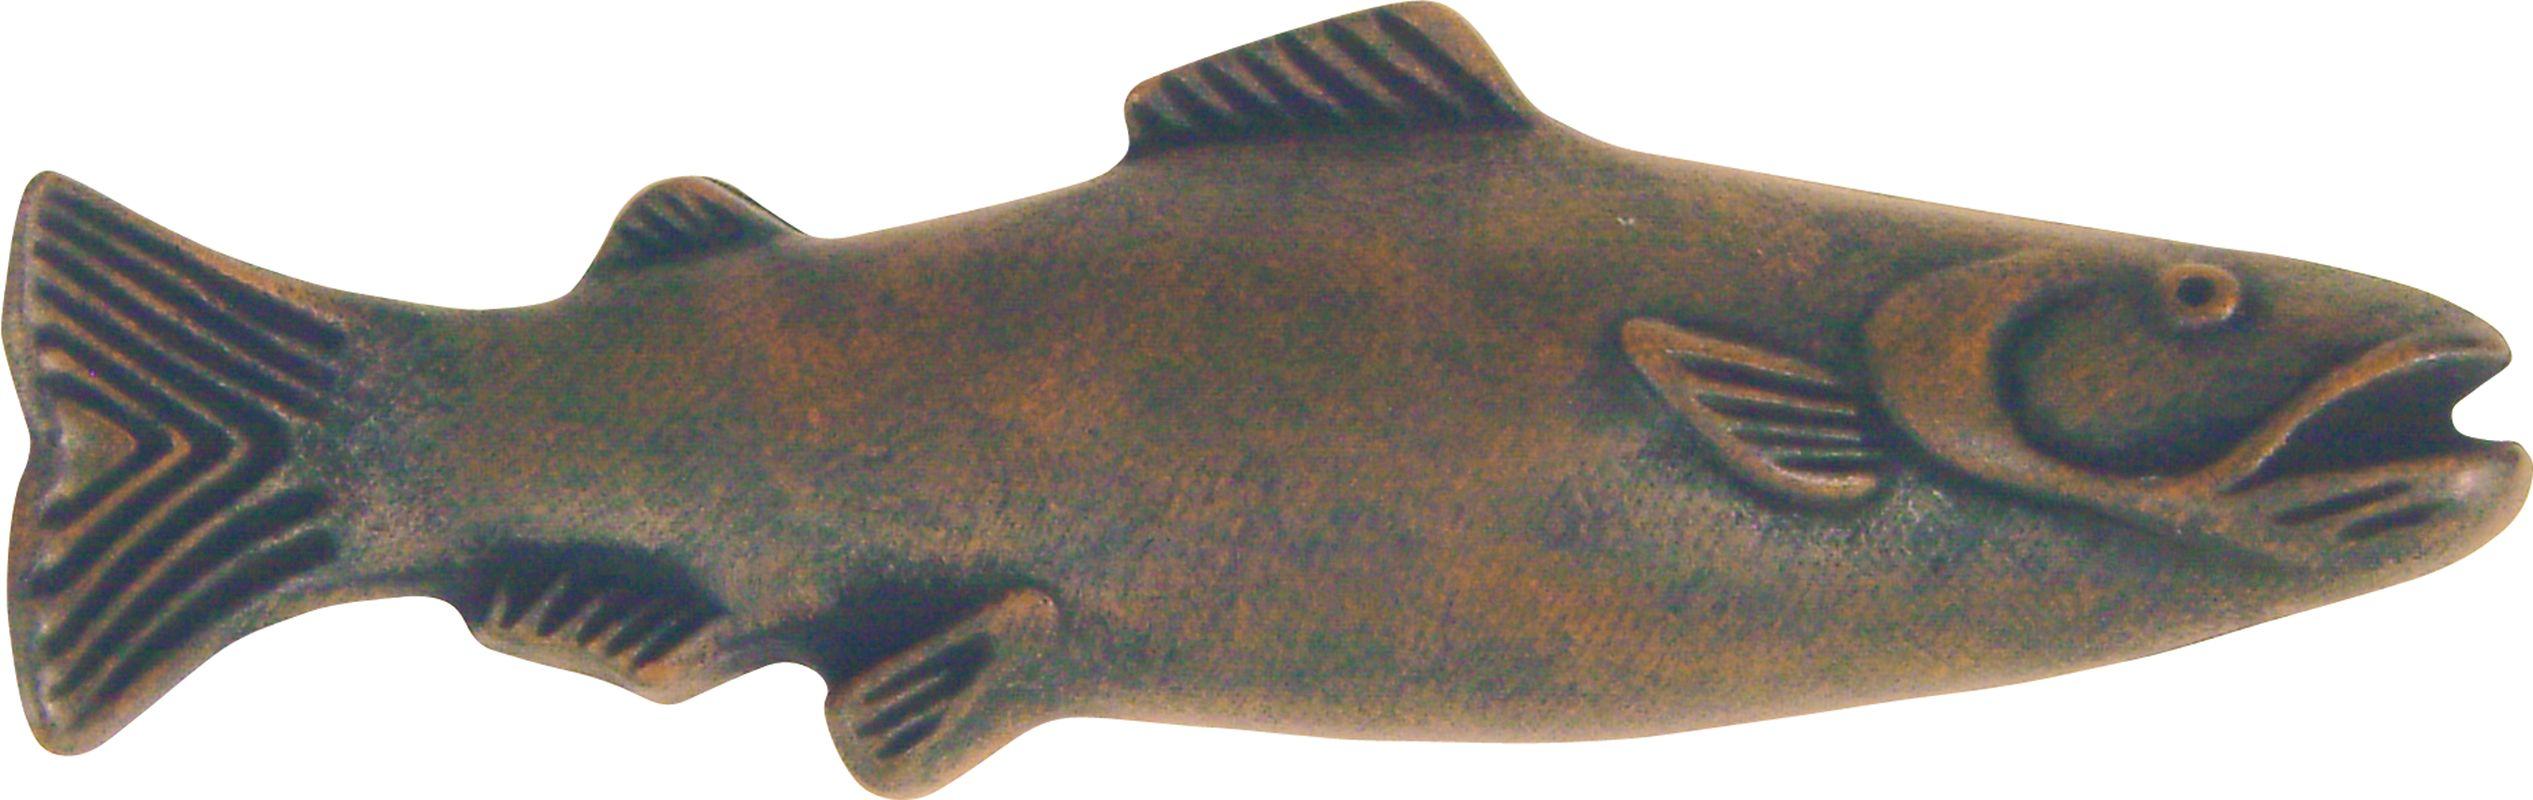 Atlas homewares 2217 brn brushed nickel fish collection for Fish drawer pulls